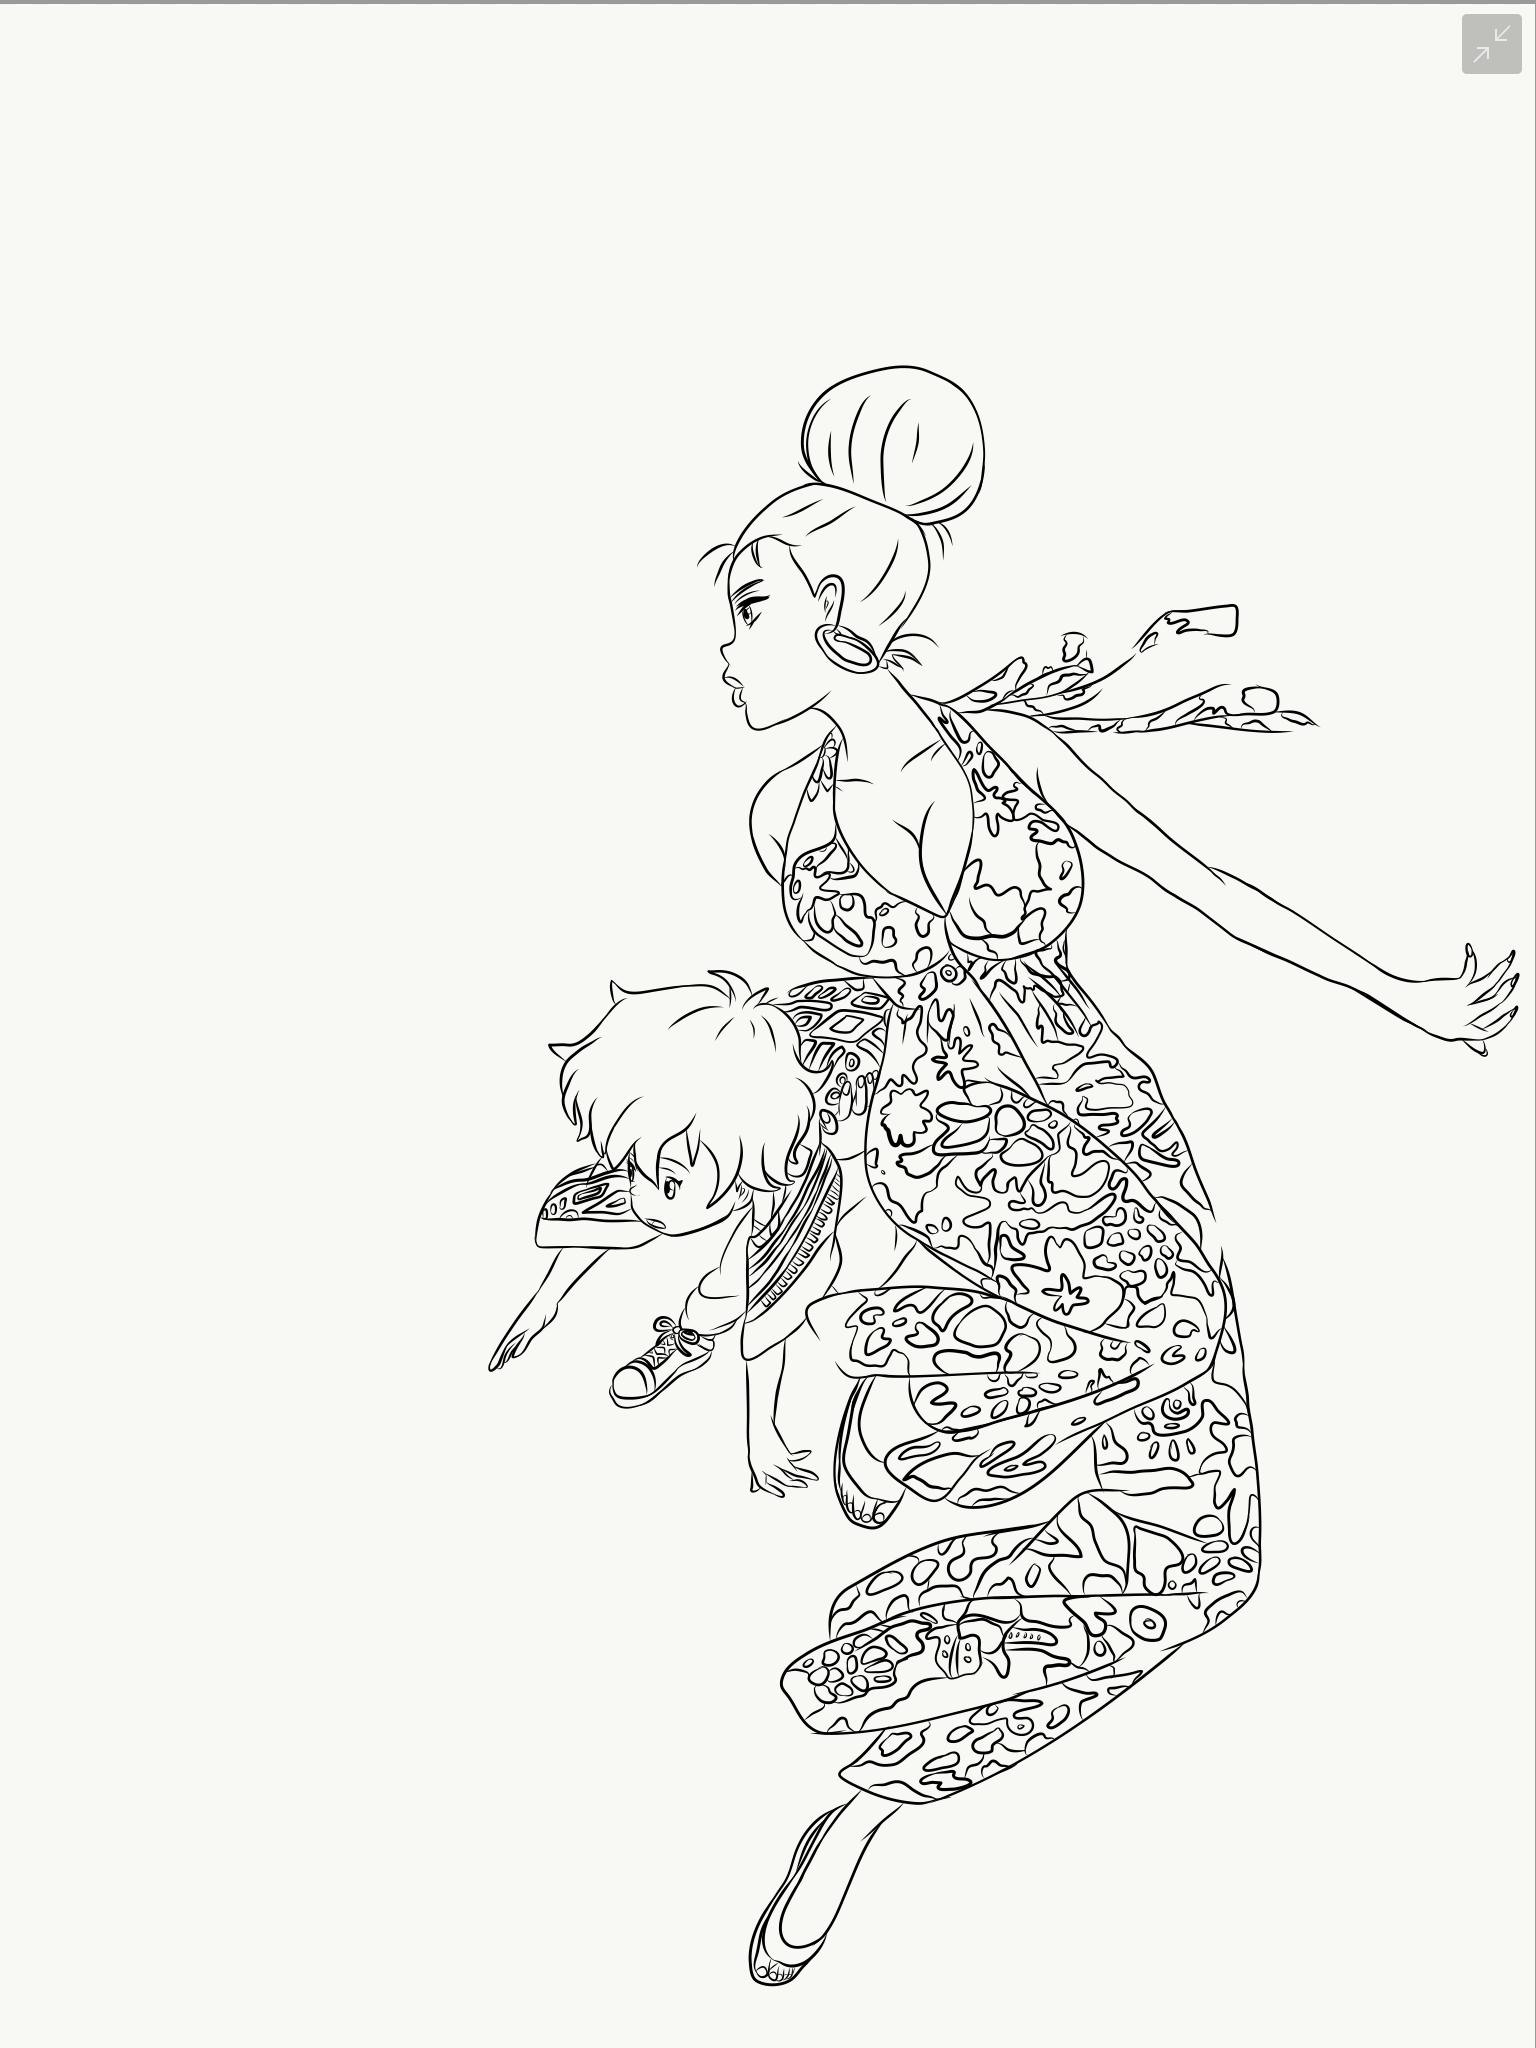 michiko-and-hatchin-pop-art-process-image-1.png